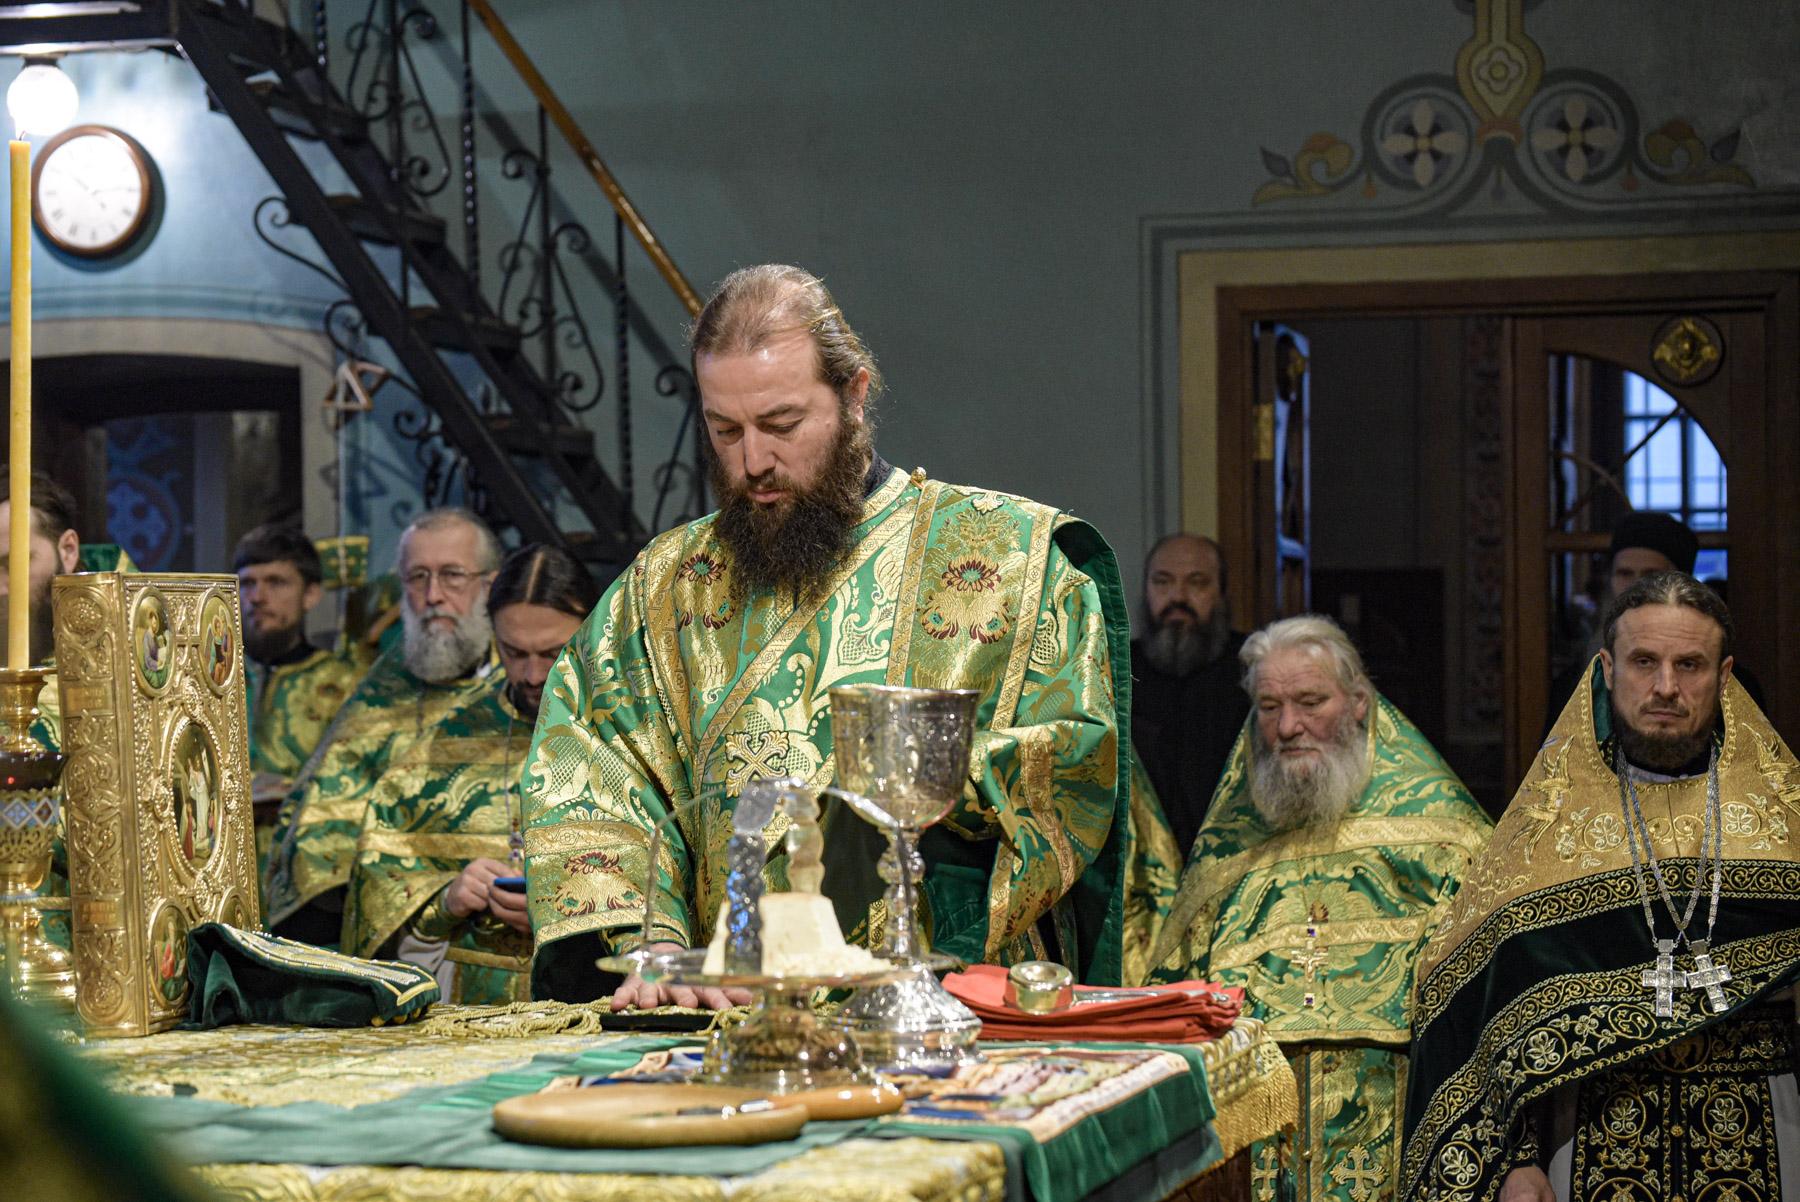 photos of orthodox christmas 0187 2